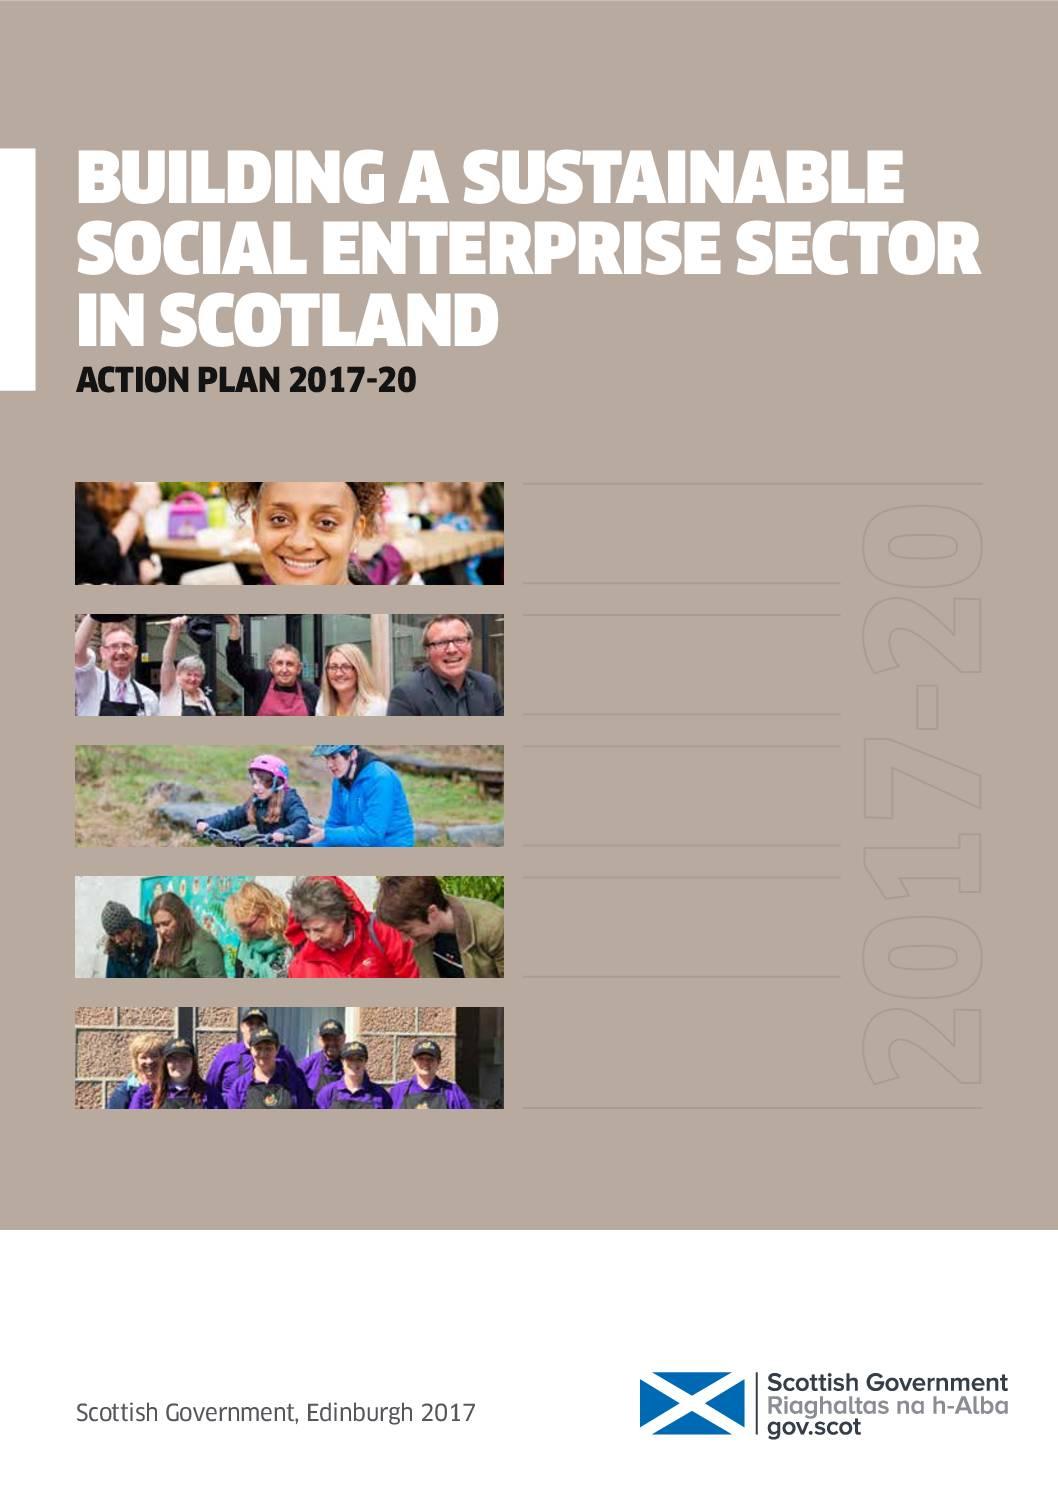 Scotland's first 3-Year Social Enterprise Action Plan